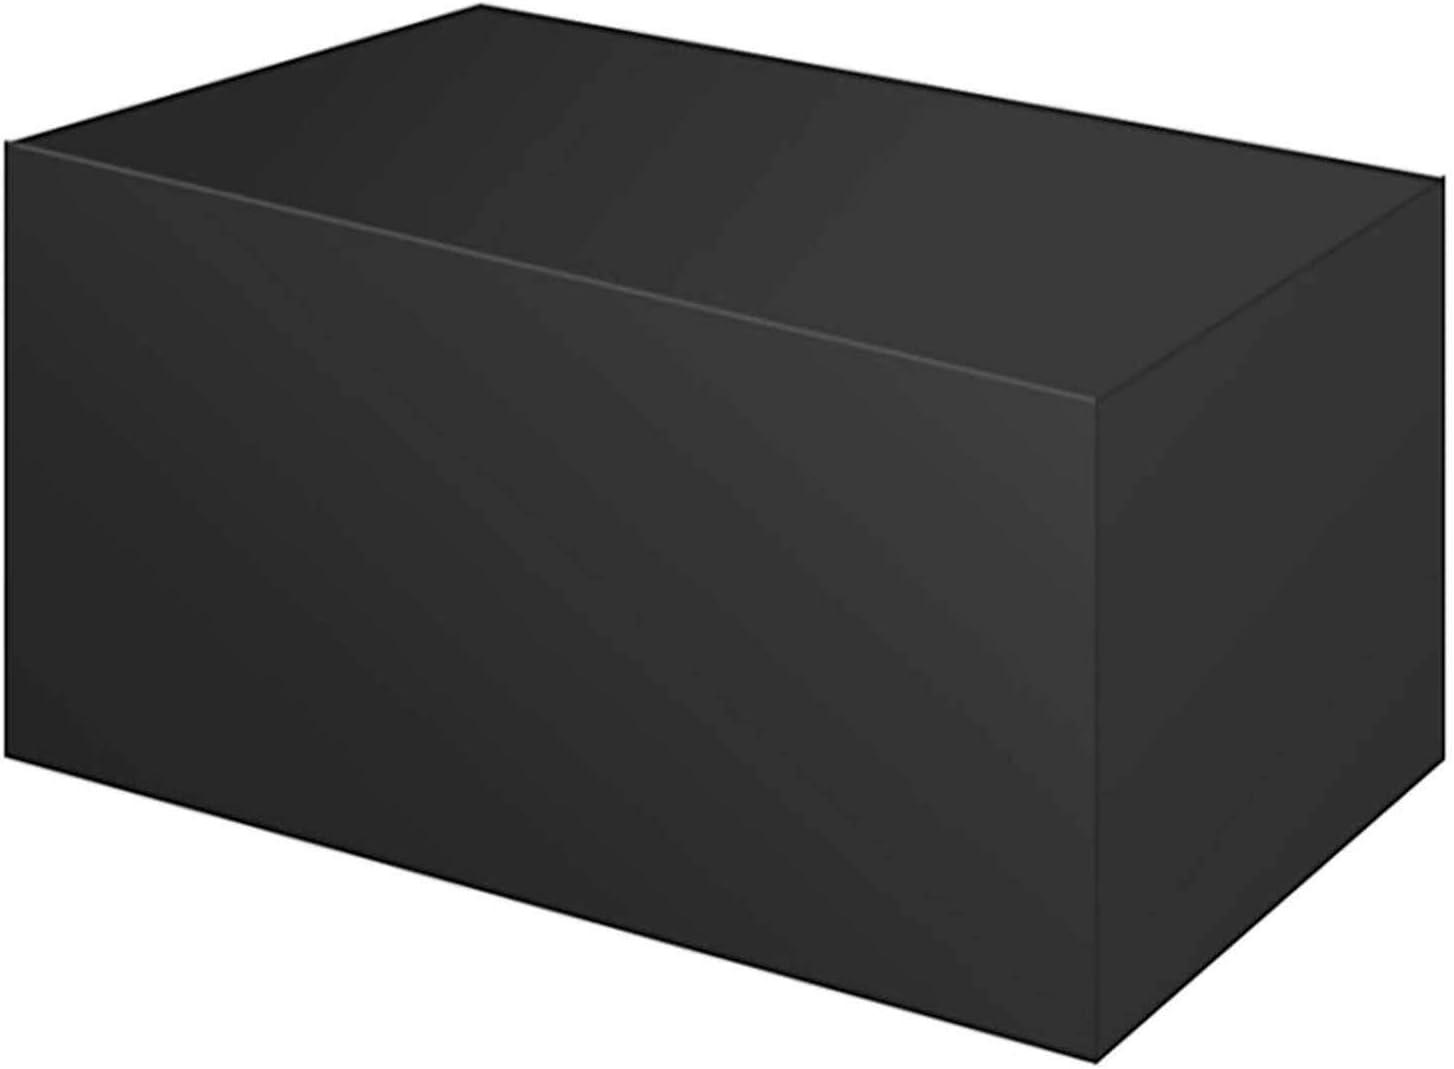 "WZDD Patio Table Set Tulsa Mall Cover 83""x55""31"" Max 60% OFF Wat Furniture"